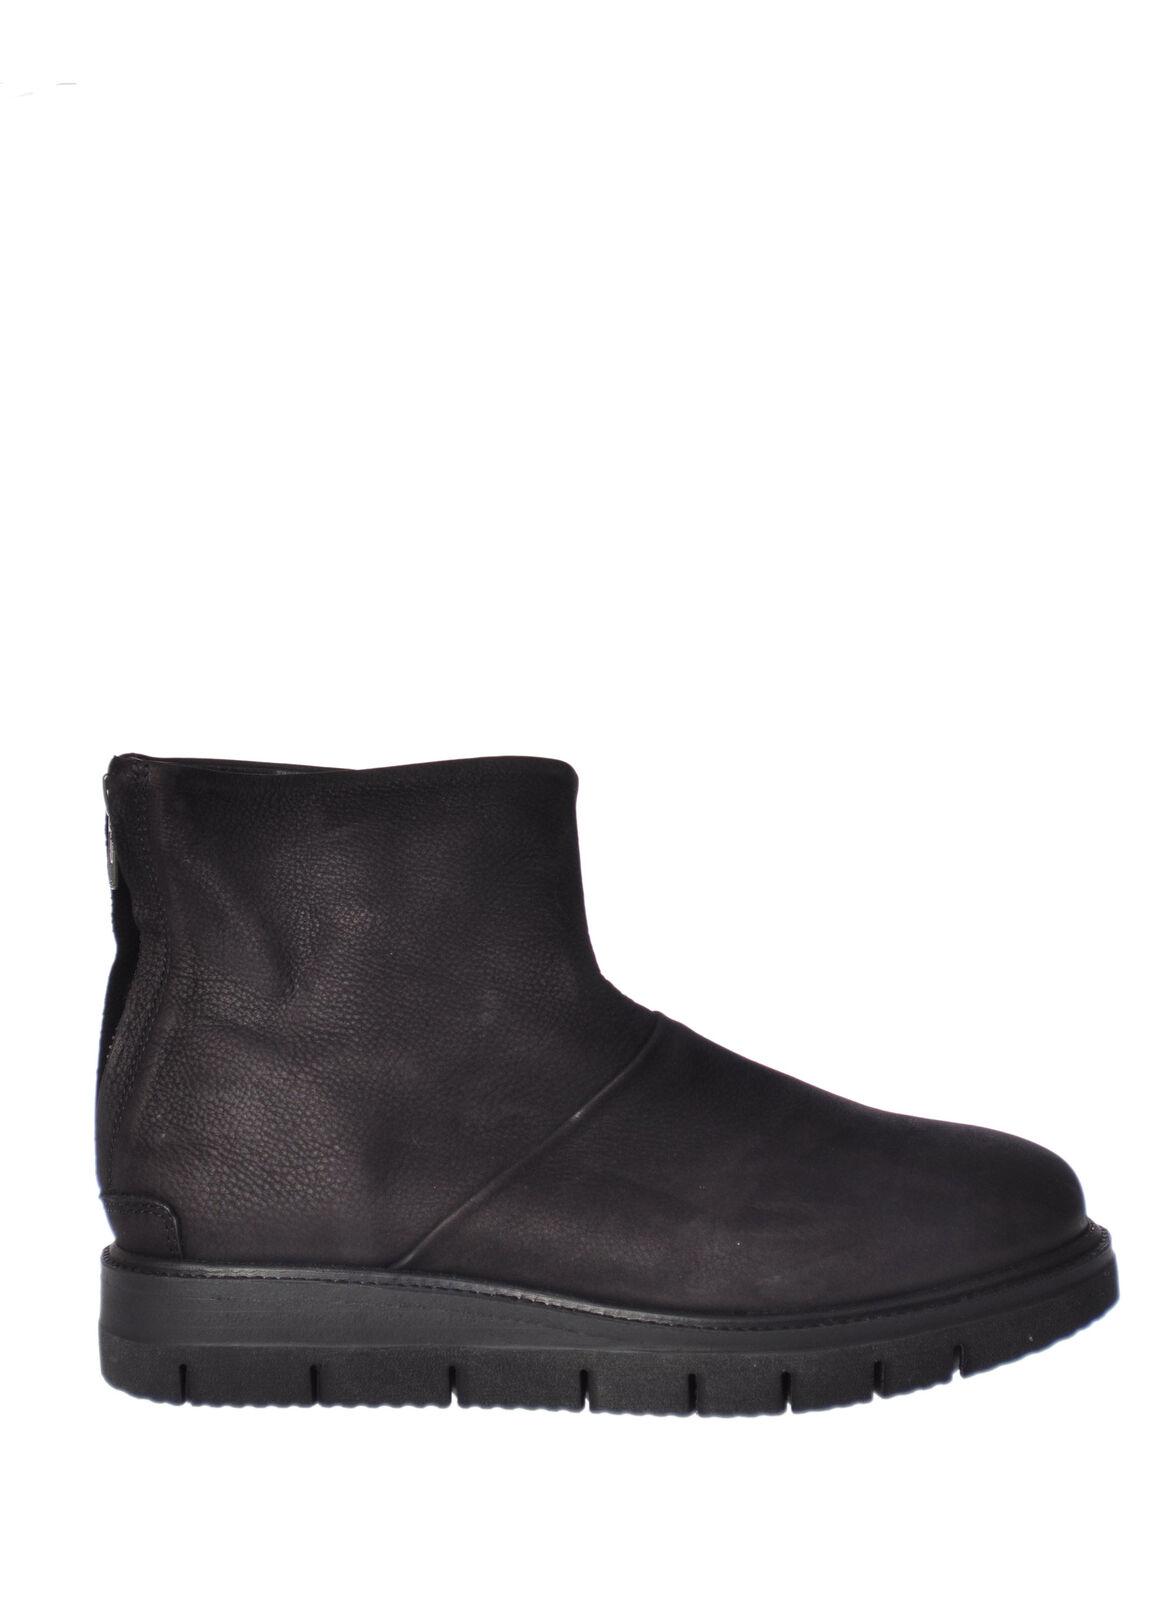 Lemarè - zapatos-Ankle-botas - Woman - negro - 450915C184104